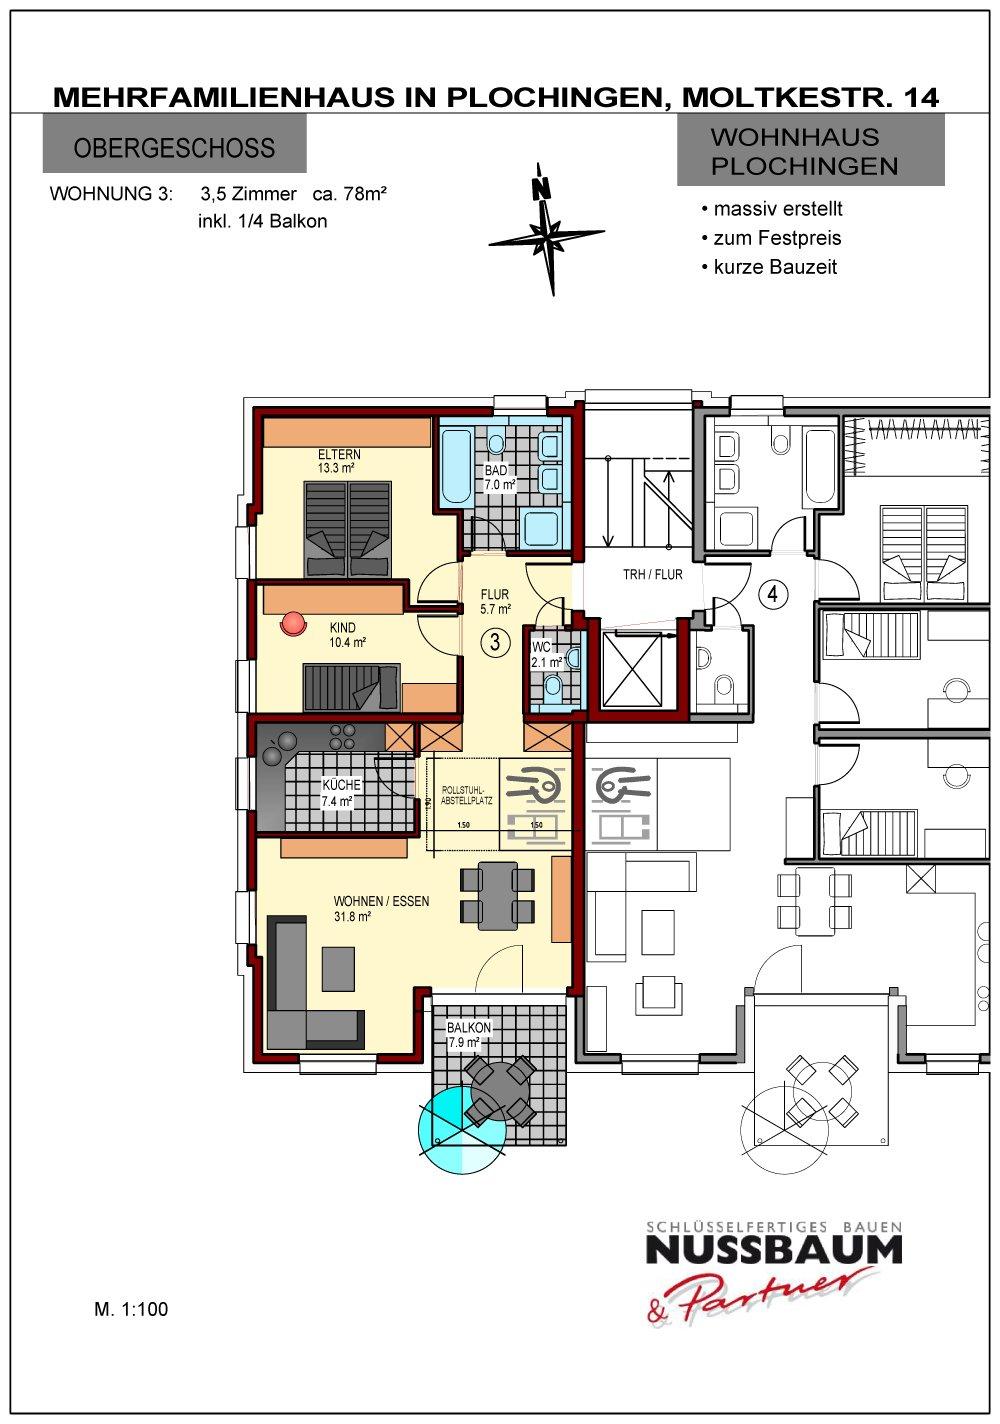 mehrfamilienhaus plochingen plochingen nu baum. Black Bedroom Furniture Sets. Home Design Ideas